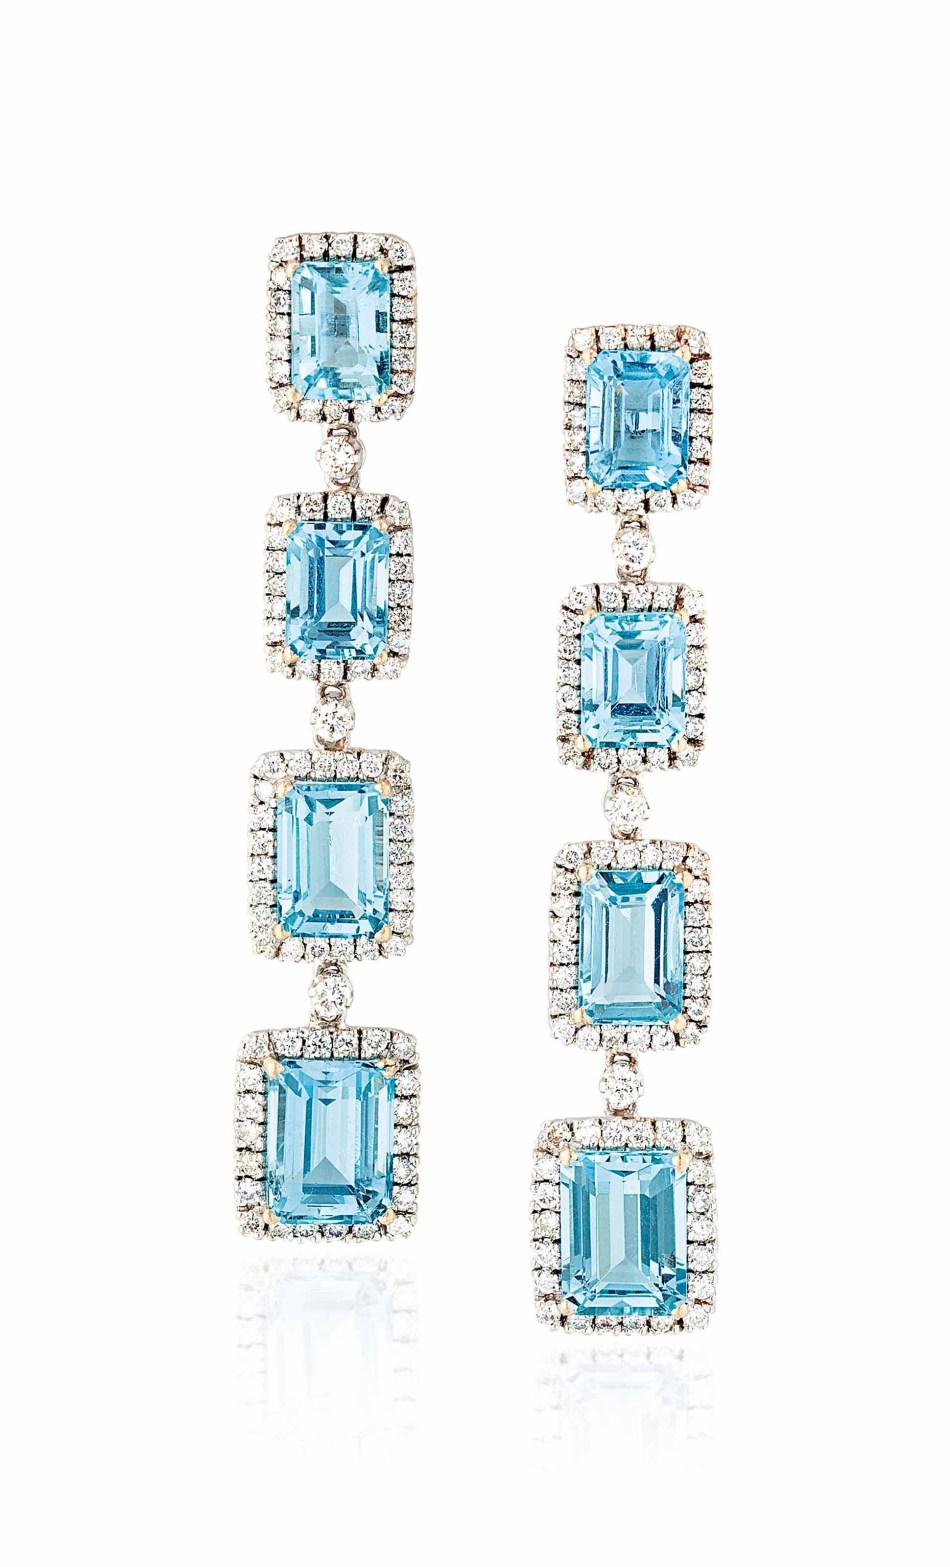 Lot 83 (aquamarine_and_diamond_earrings)